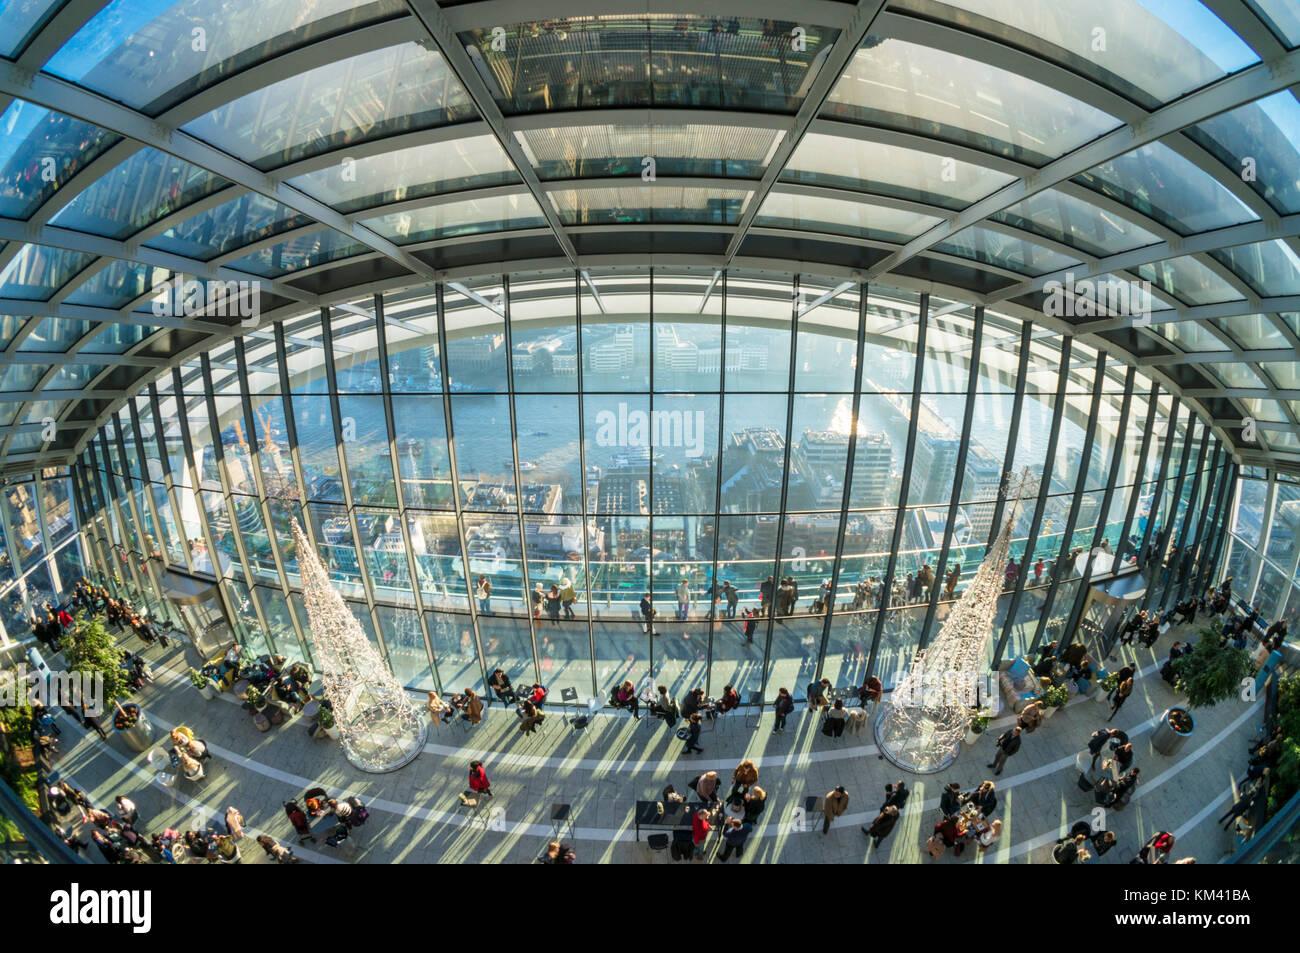 England London England London die Walkie talkie Gebäude Hochhaus oder 20 Fenchurch Street London England UK Stockbild